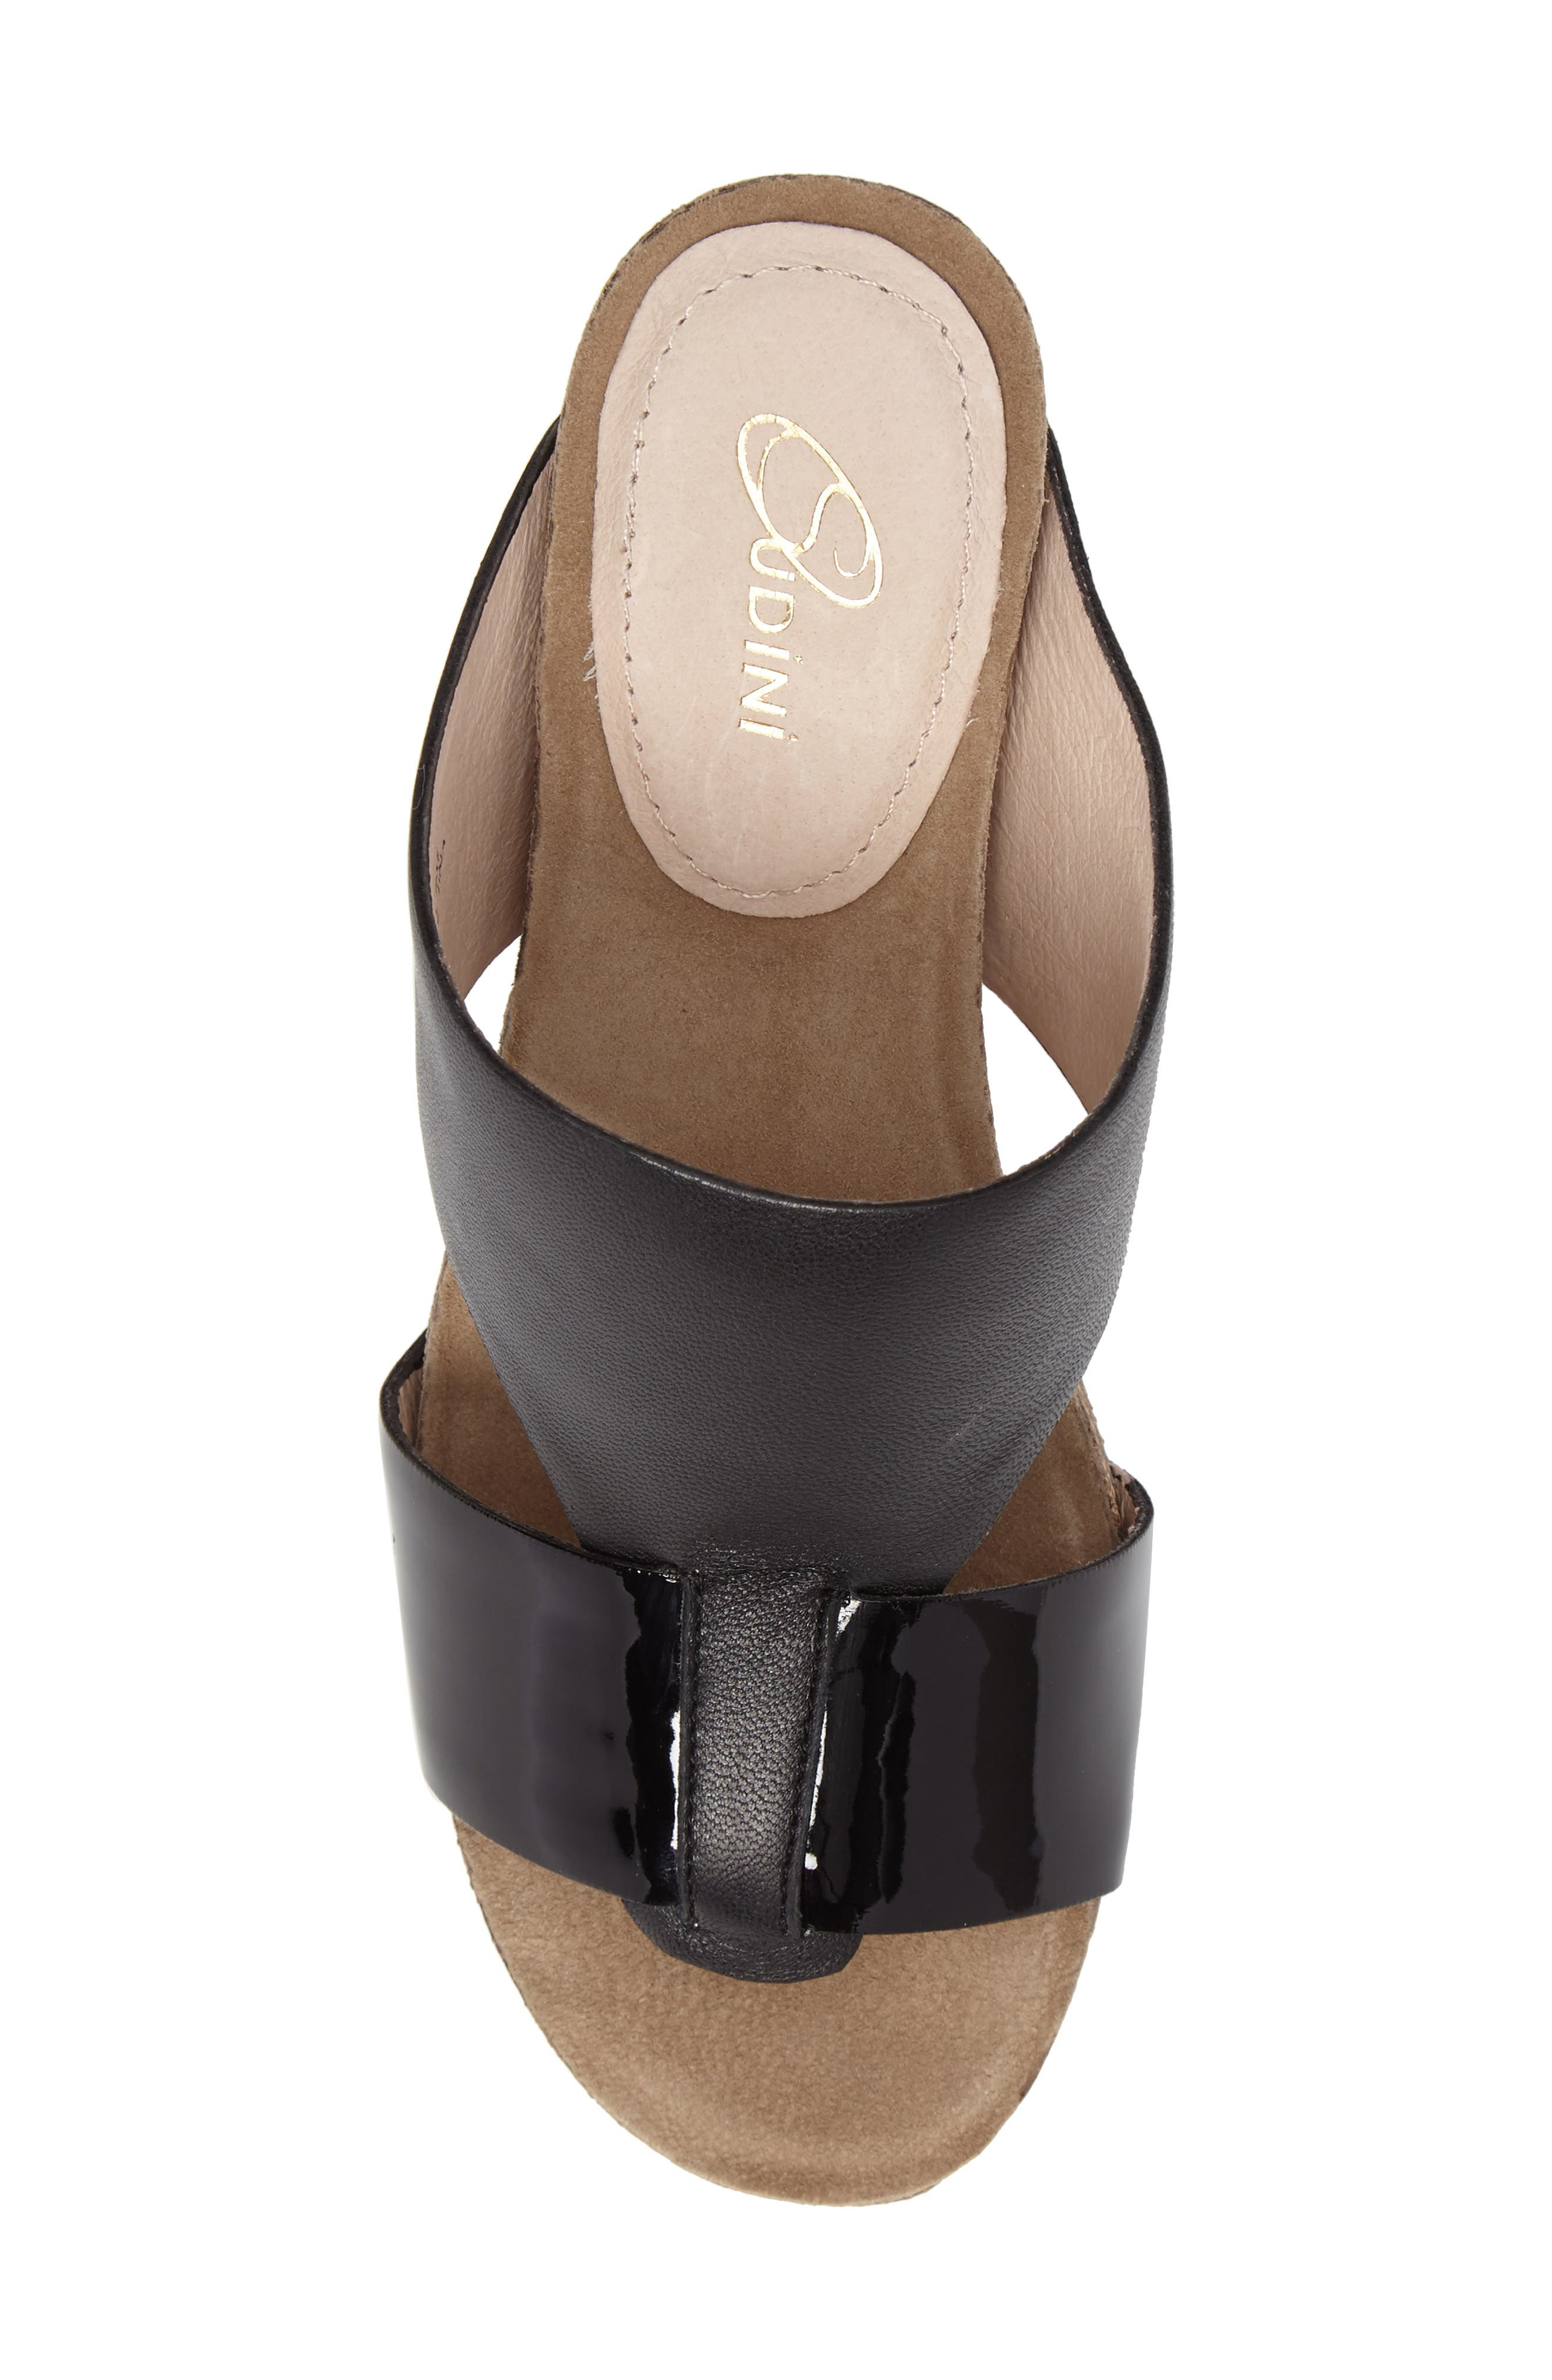 Berta Wedge Sandal,                             Alternate thumbnail 4, color,                             Black Leather